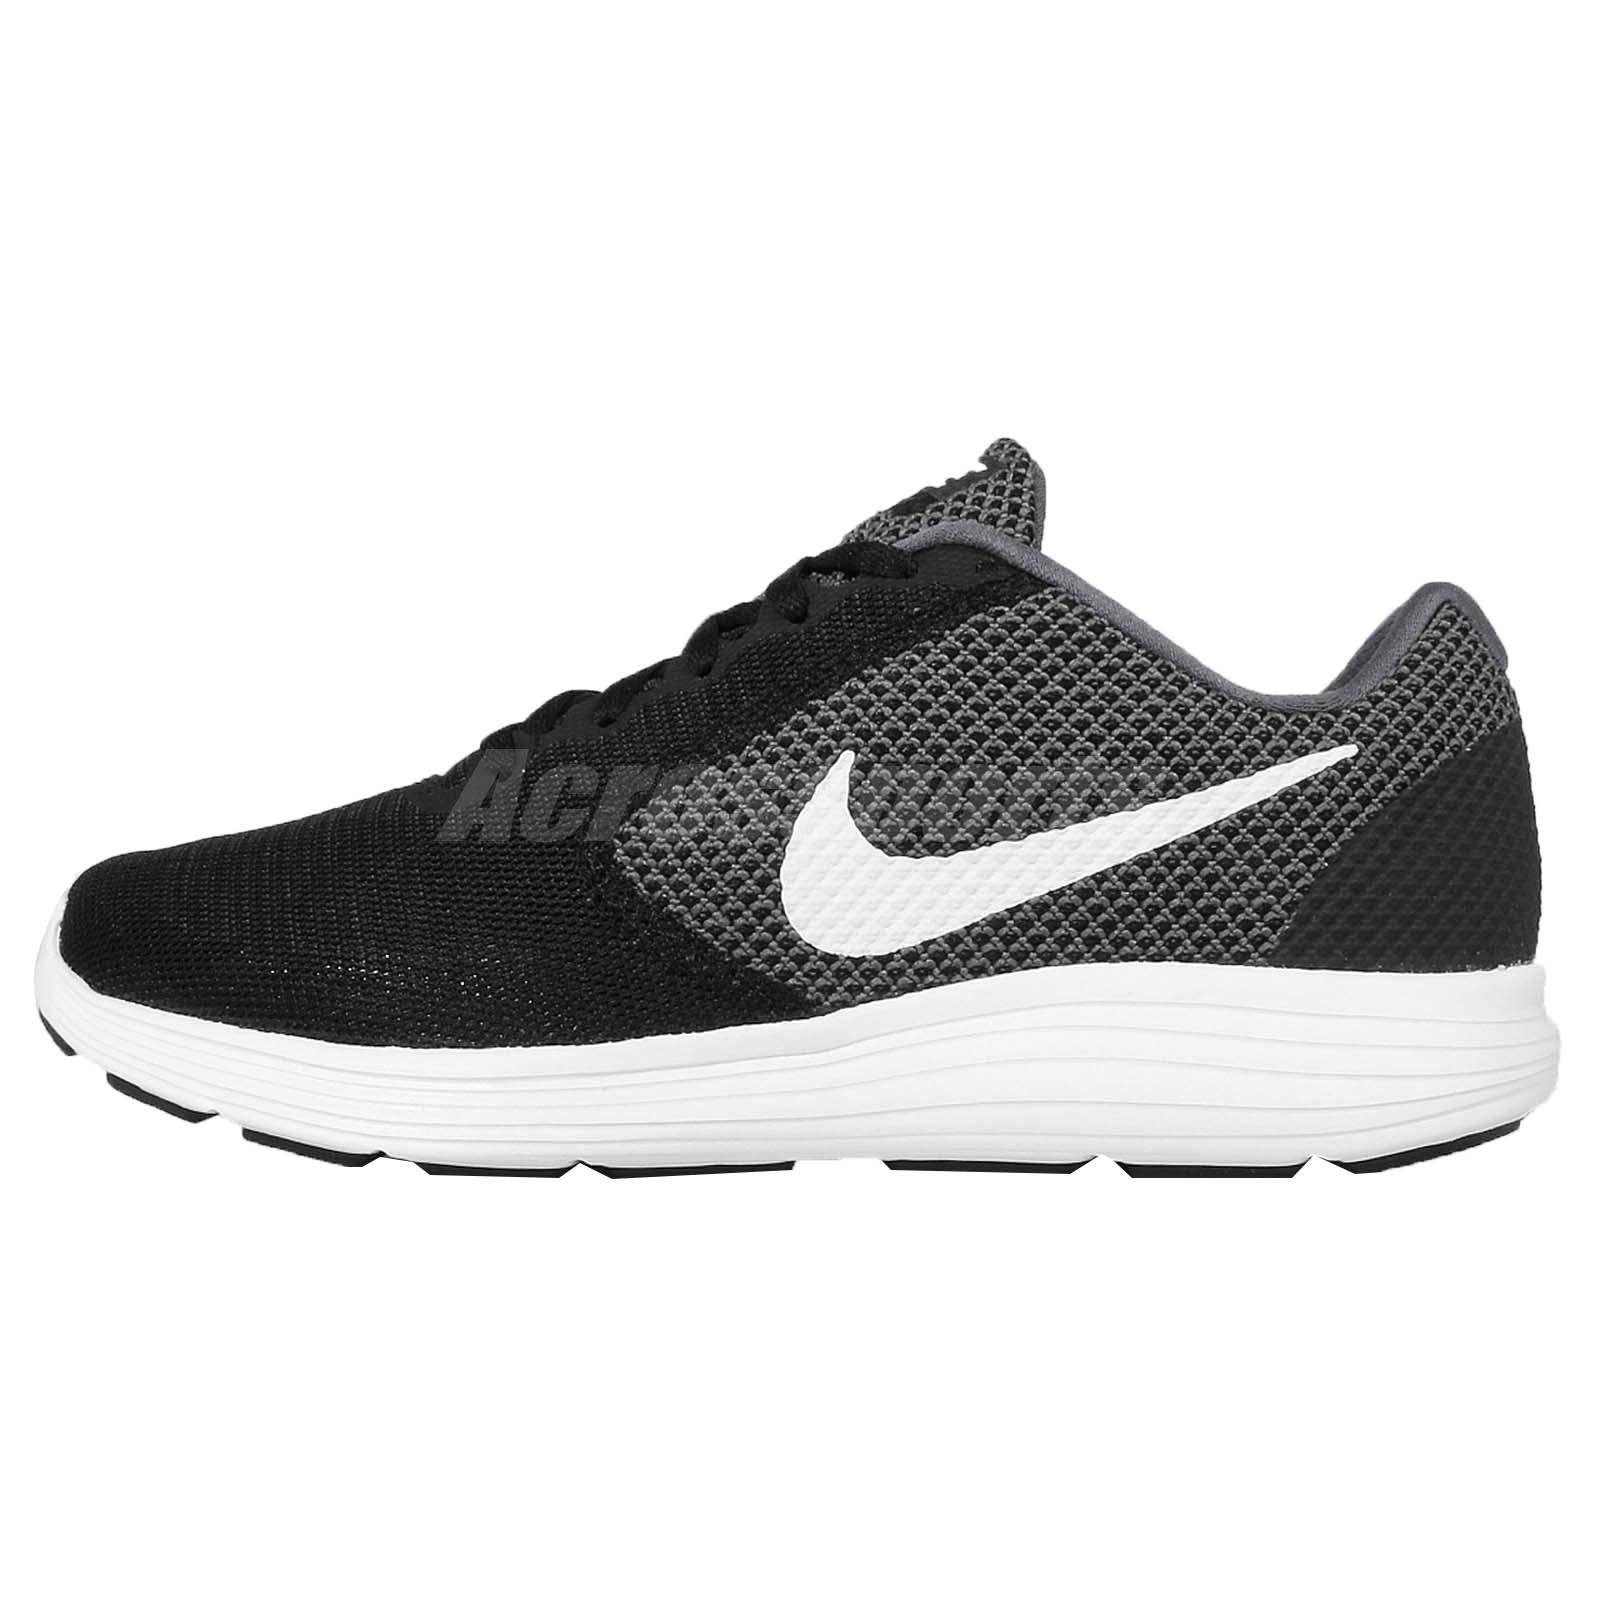 nike revolution shoes